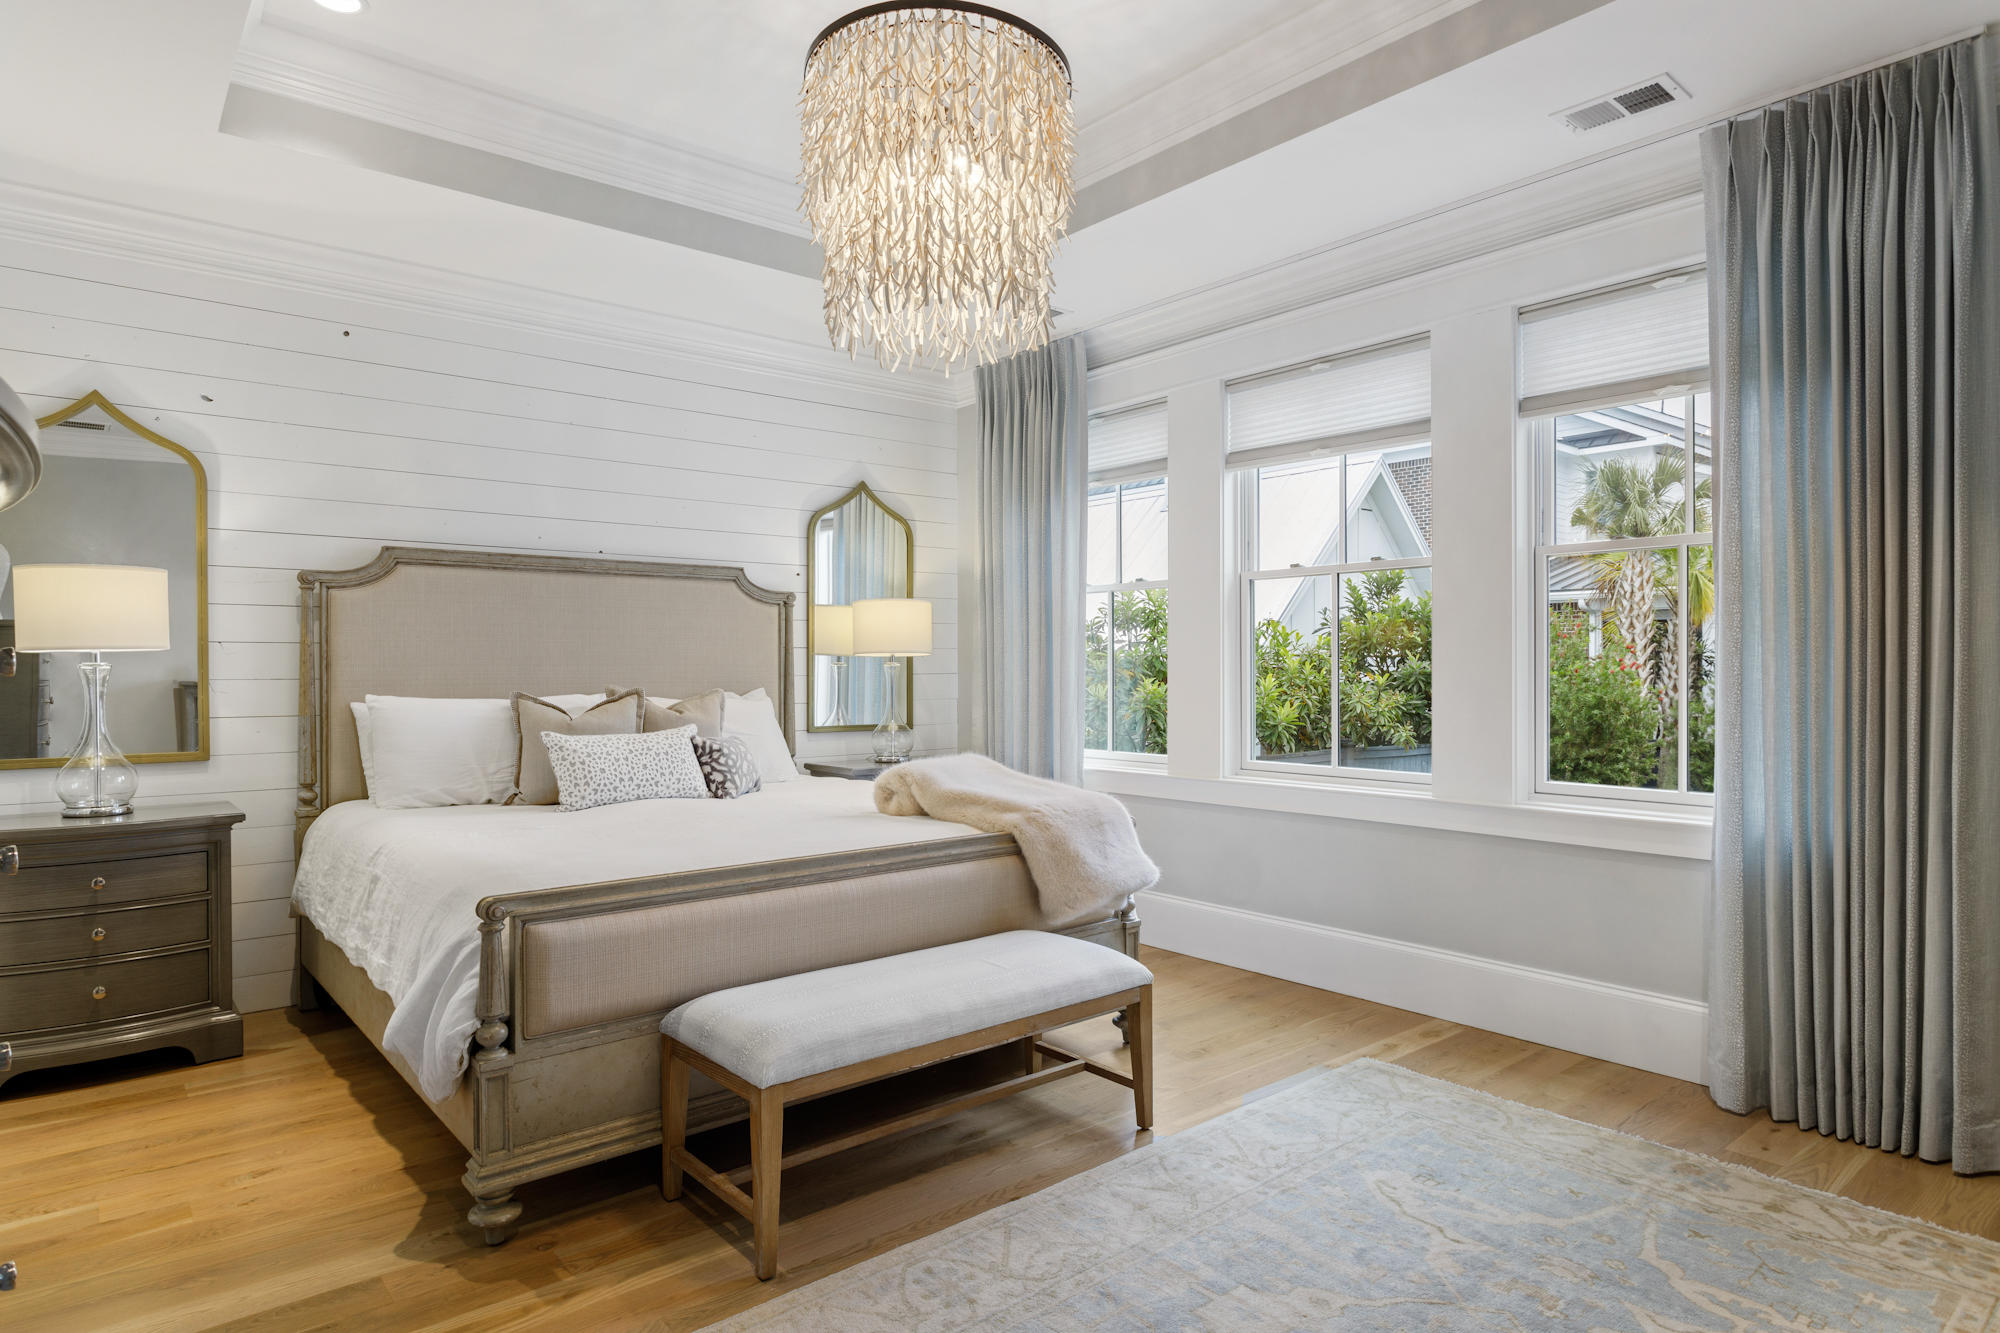 Daniel Island Park Homes For Sale - 458 Lesesne, Charleston, SC - 18